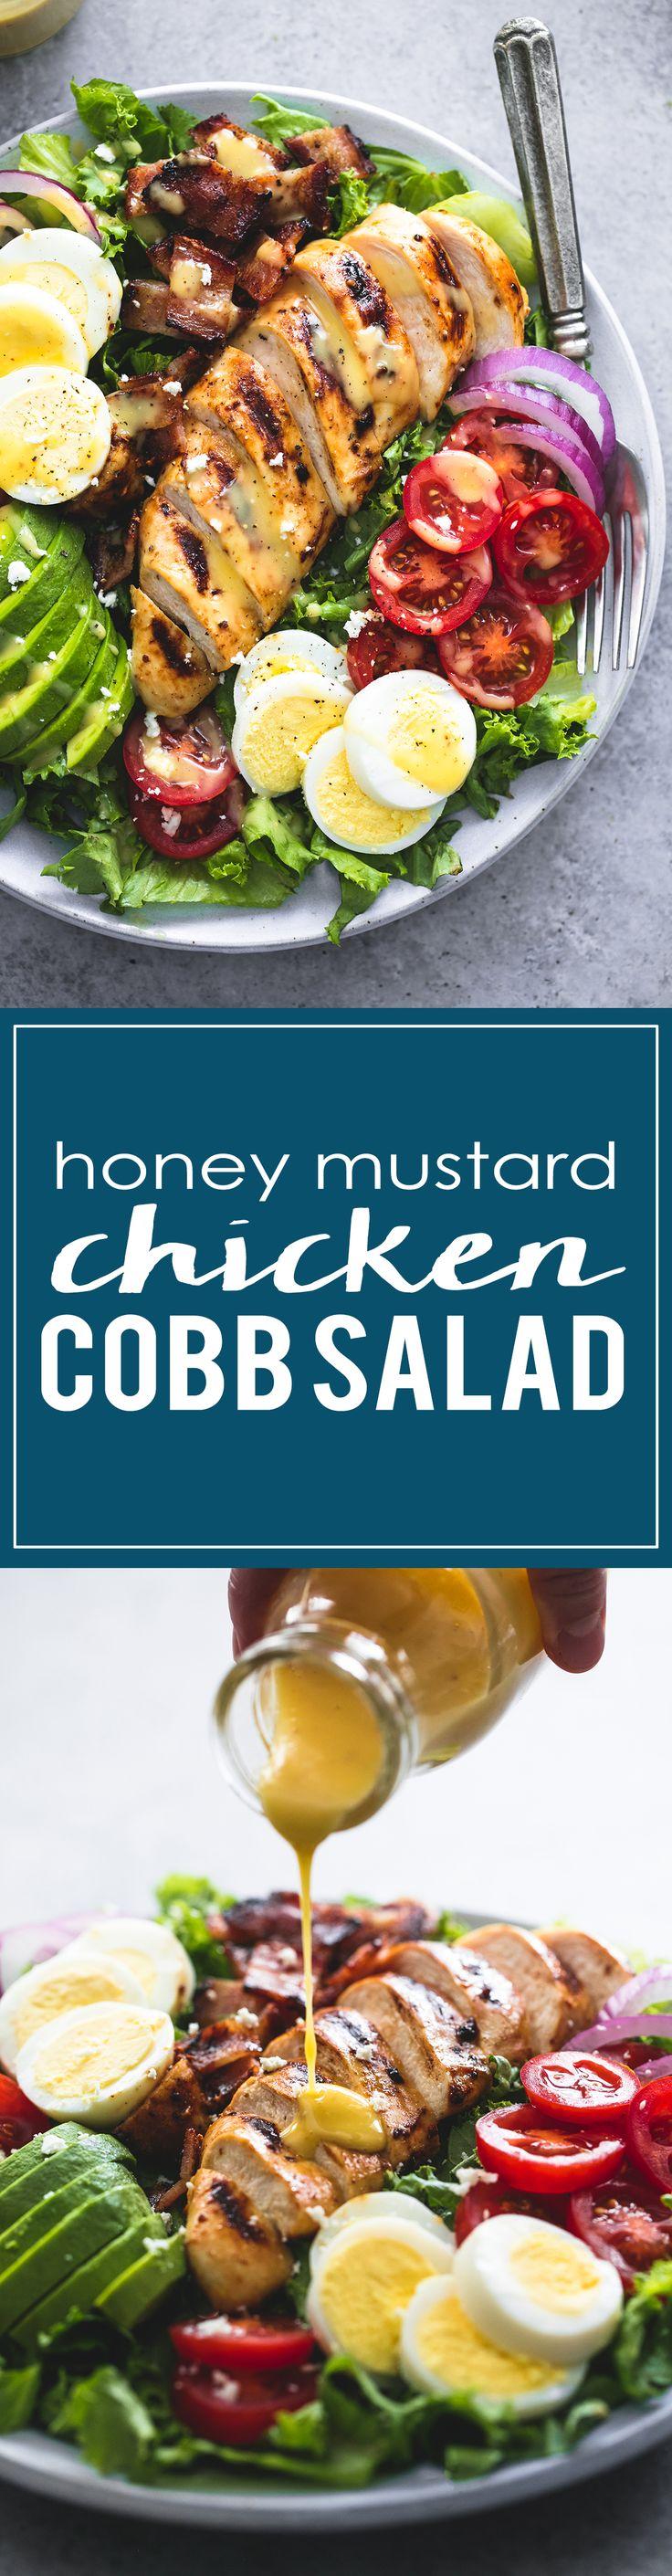 Diet salad recipes pinterest